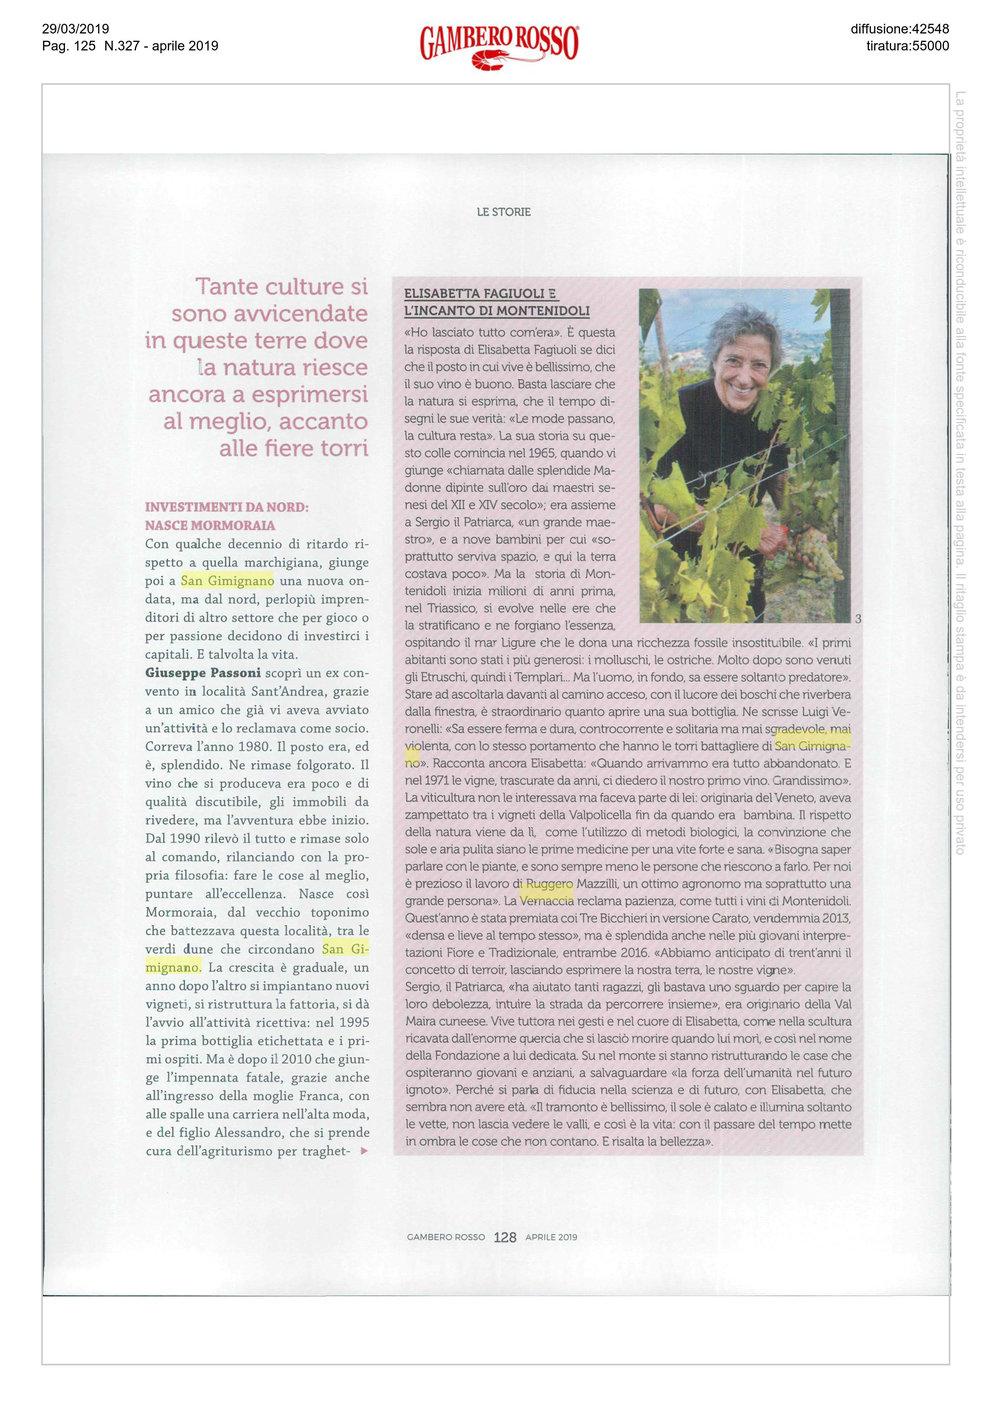 Gambero Rosso Aprile 2019_4.jpg